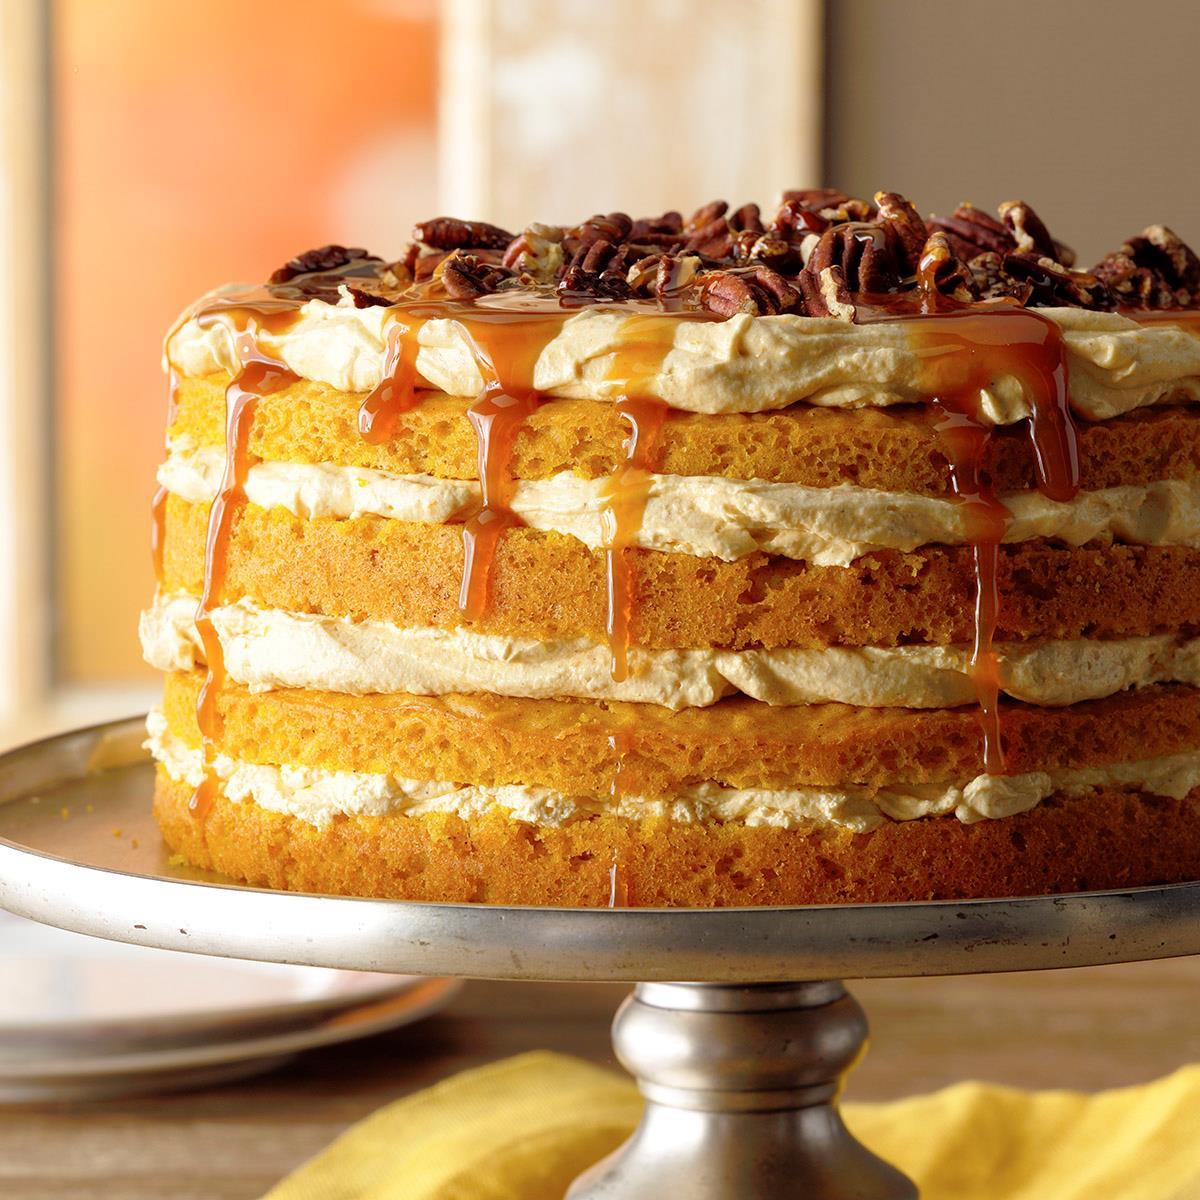 Thanksgiving Dessert Recipes  Impressive Thanksgiving Desserts You Gotta Try This Year